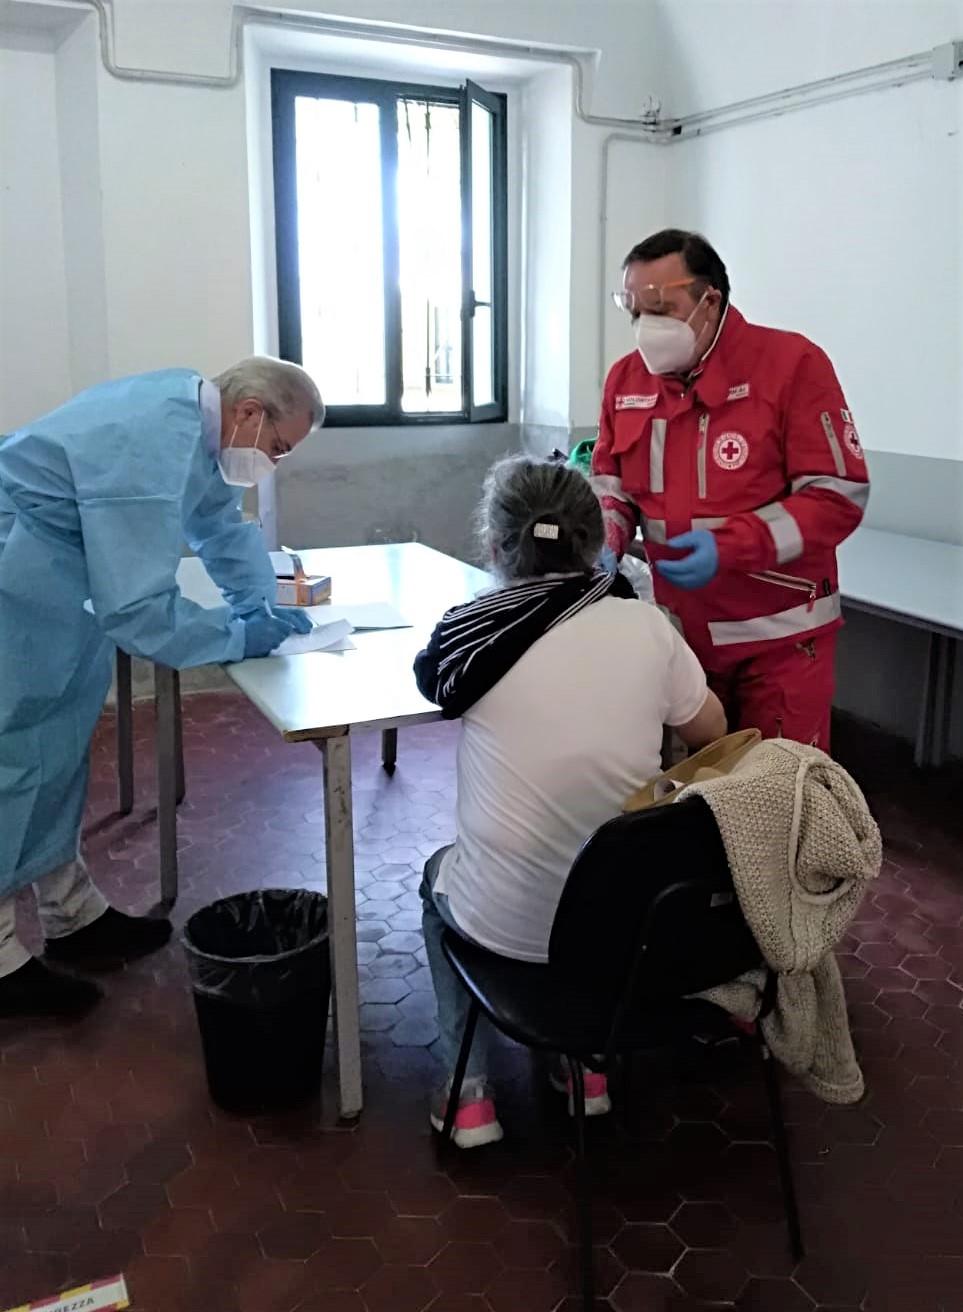 Campagna Vaccinale a Langosco (PV)